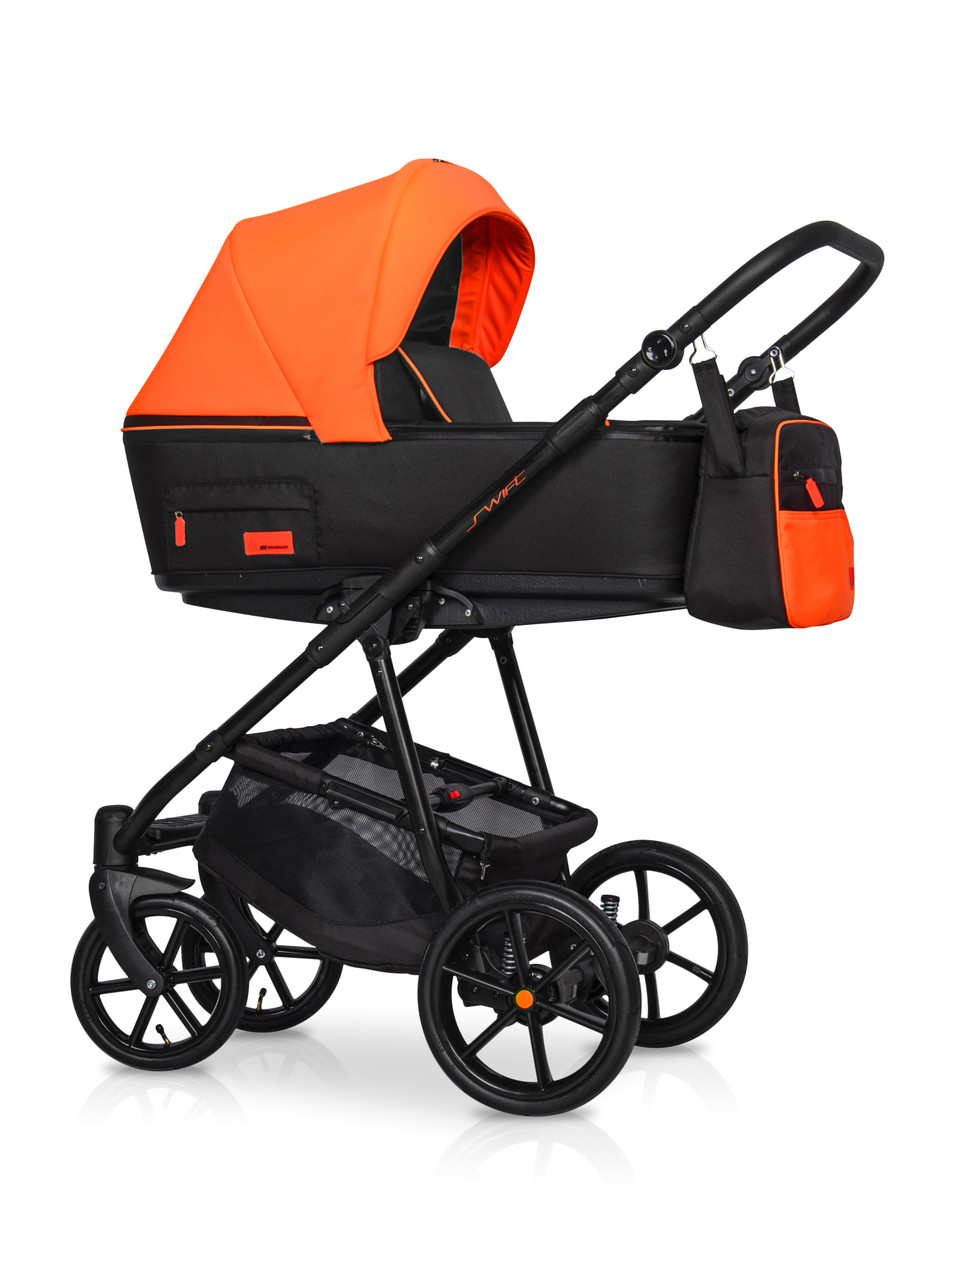 Дитяча універсальна коляска 2 в 1 Riko Swift Neon 24 Party Orange